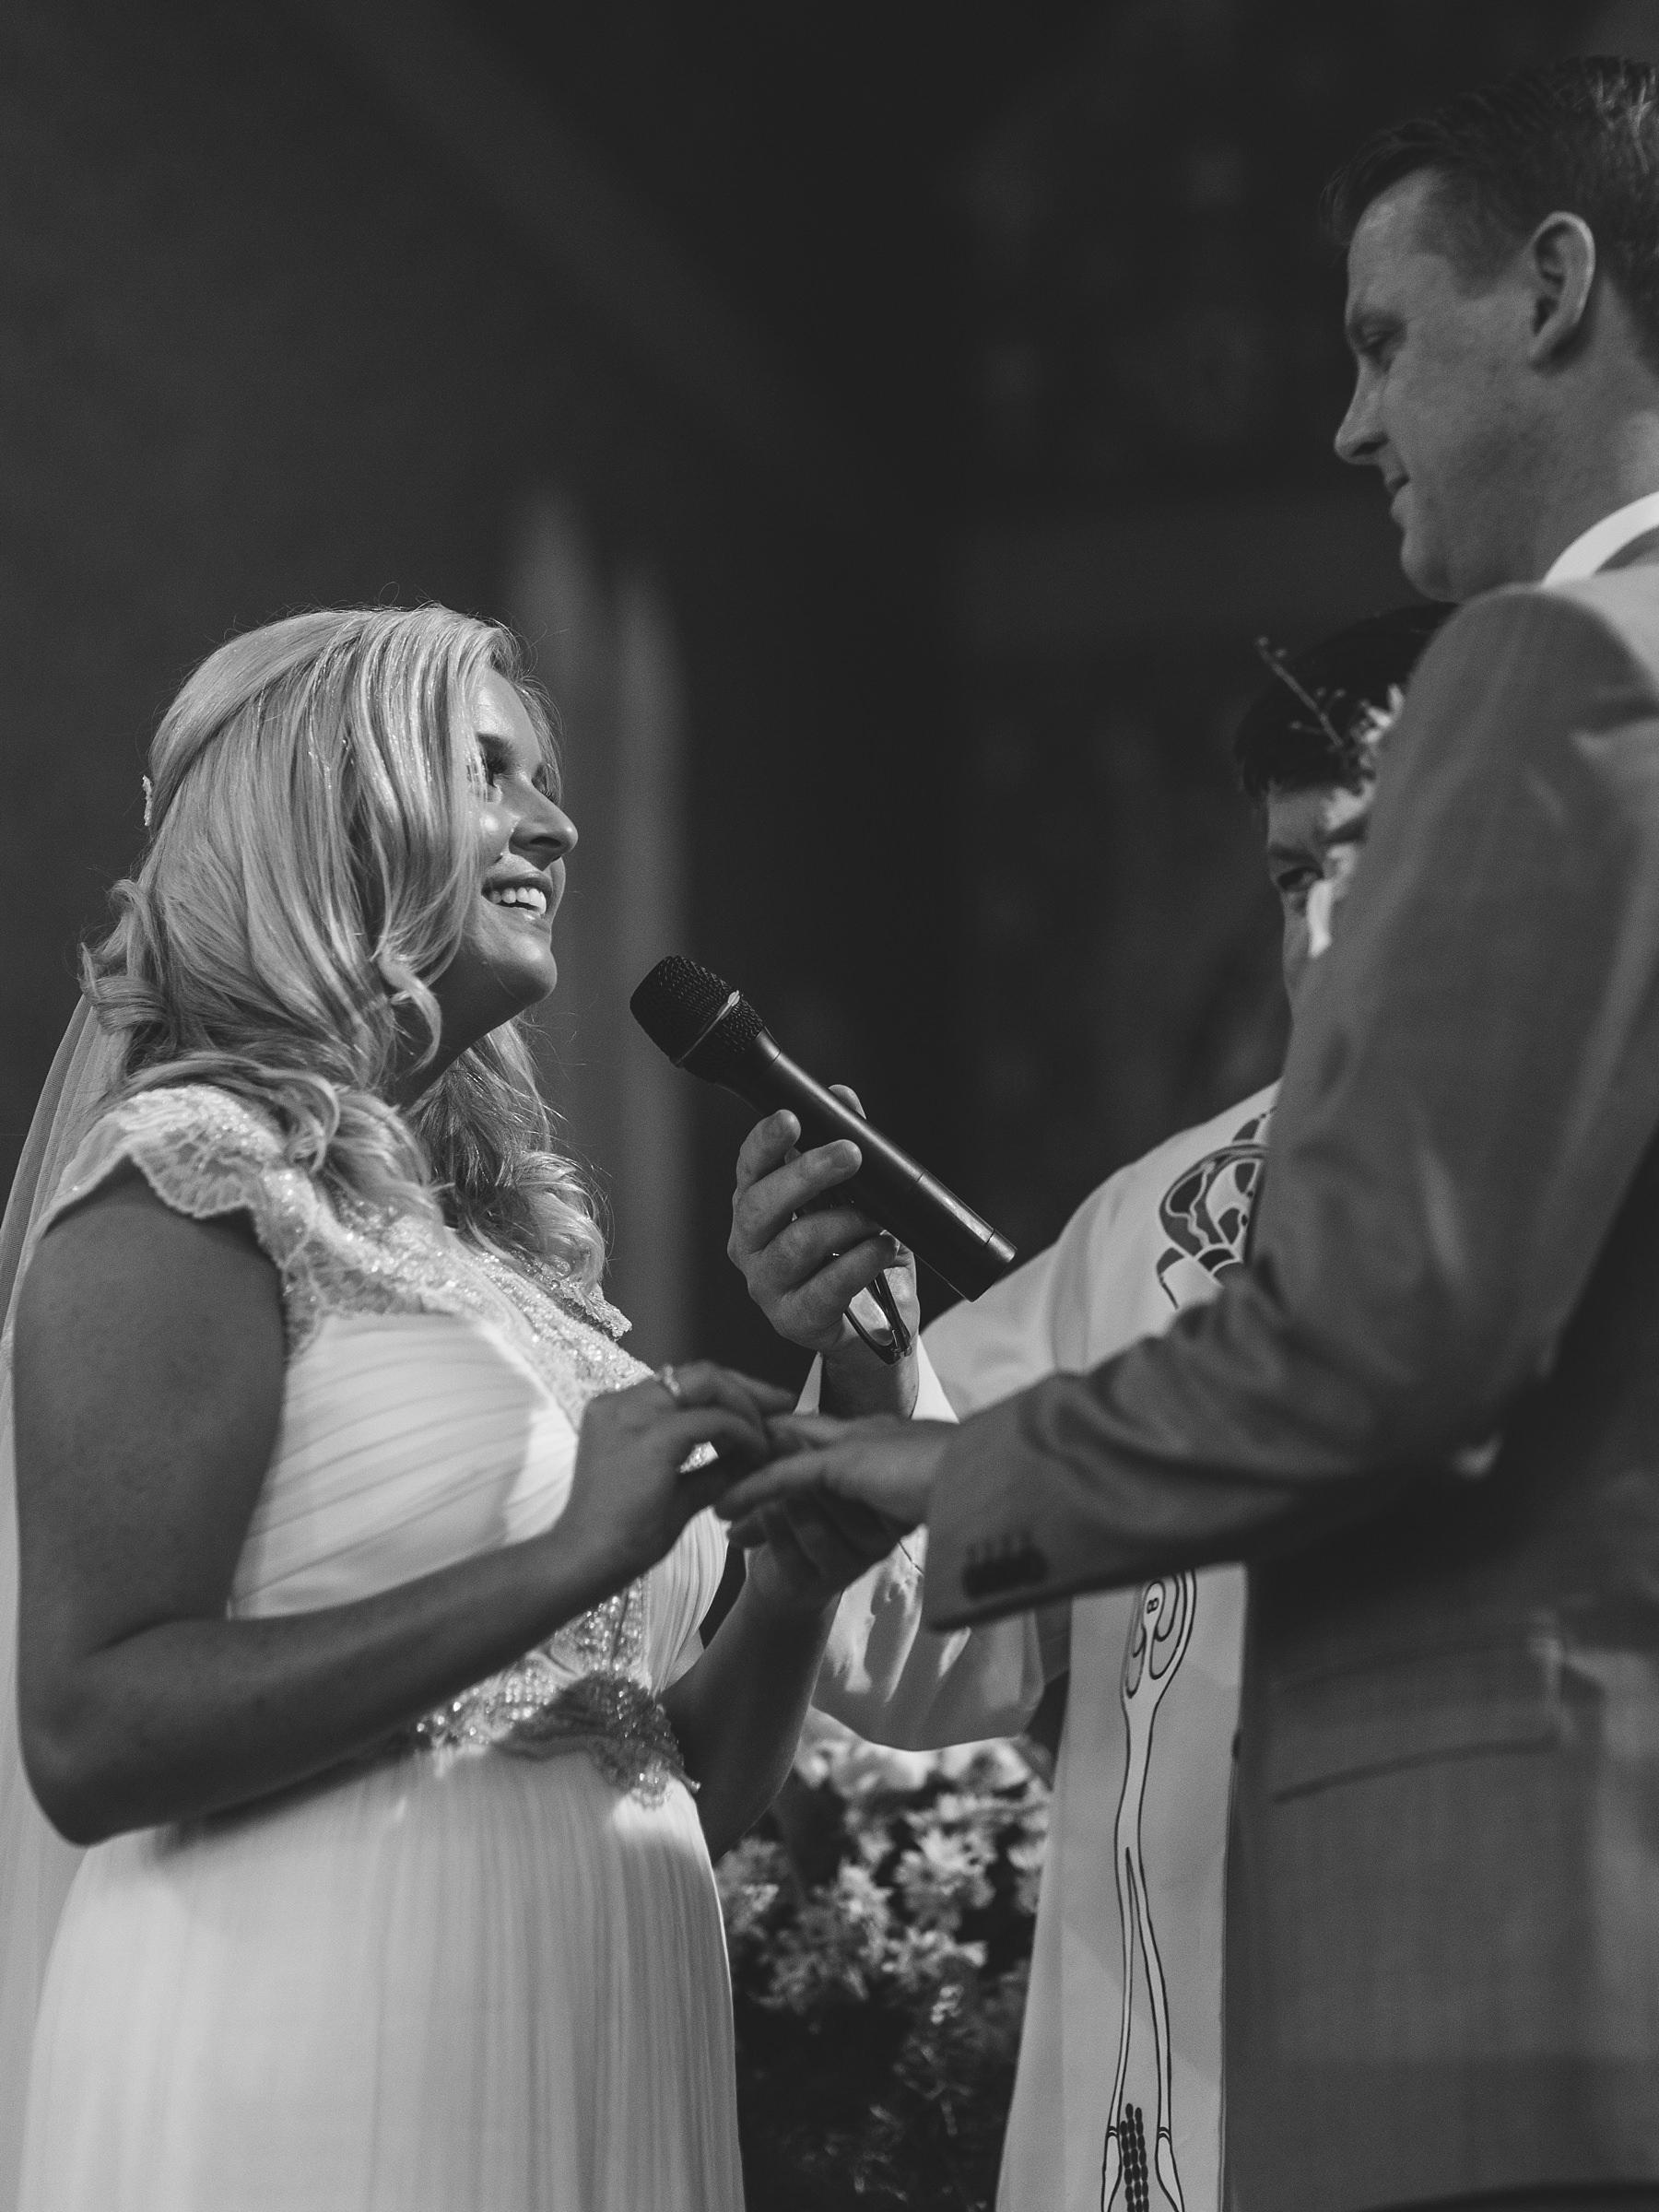 raw wedding photojournalism by jonathan david